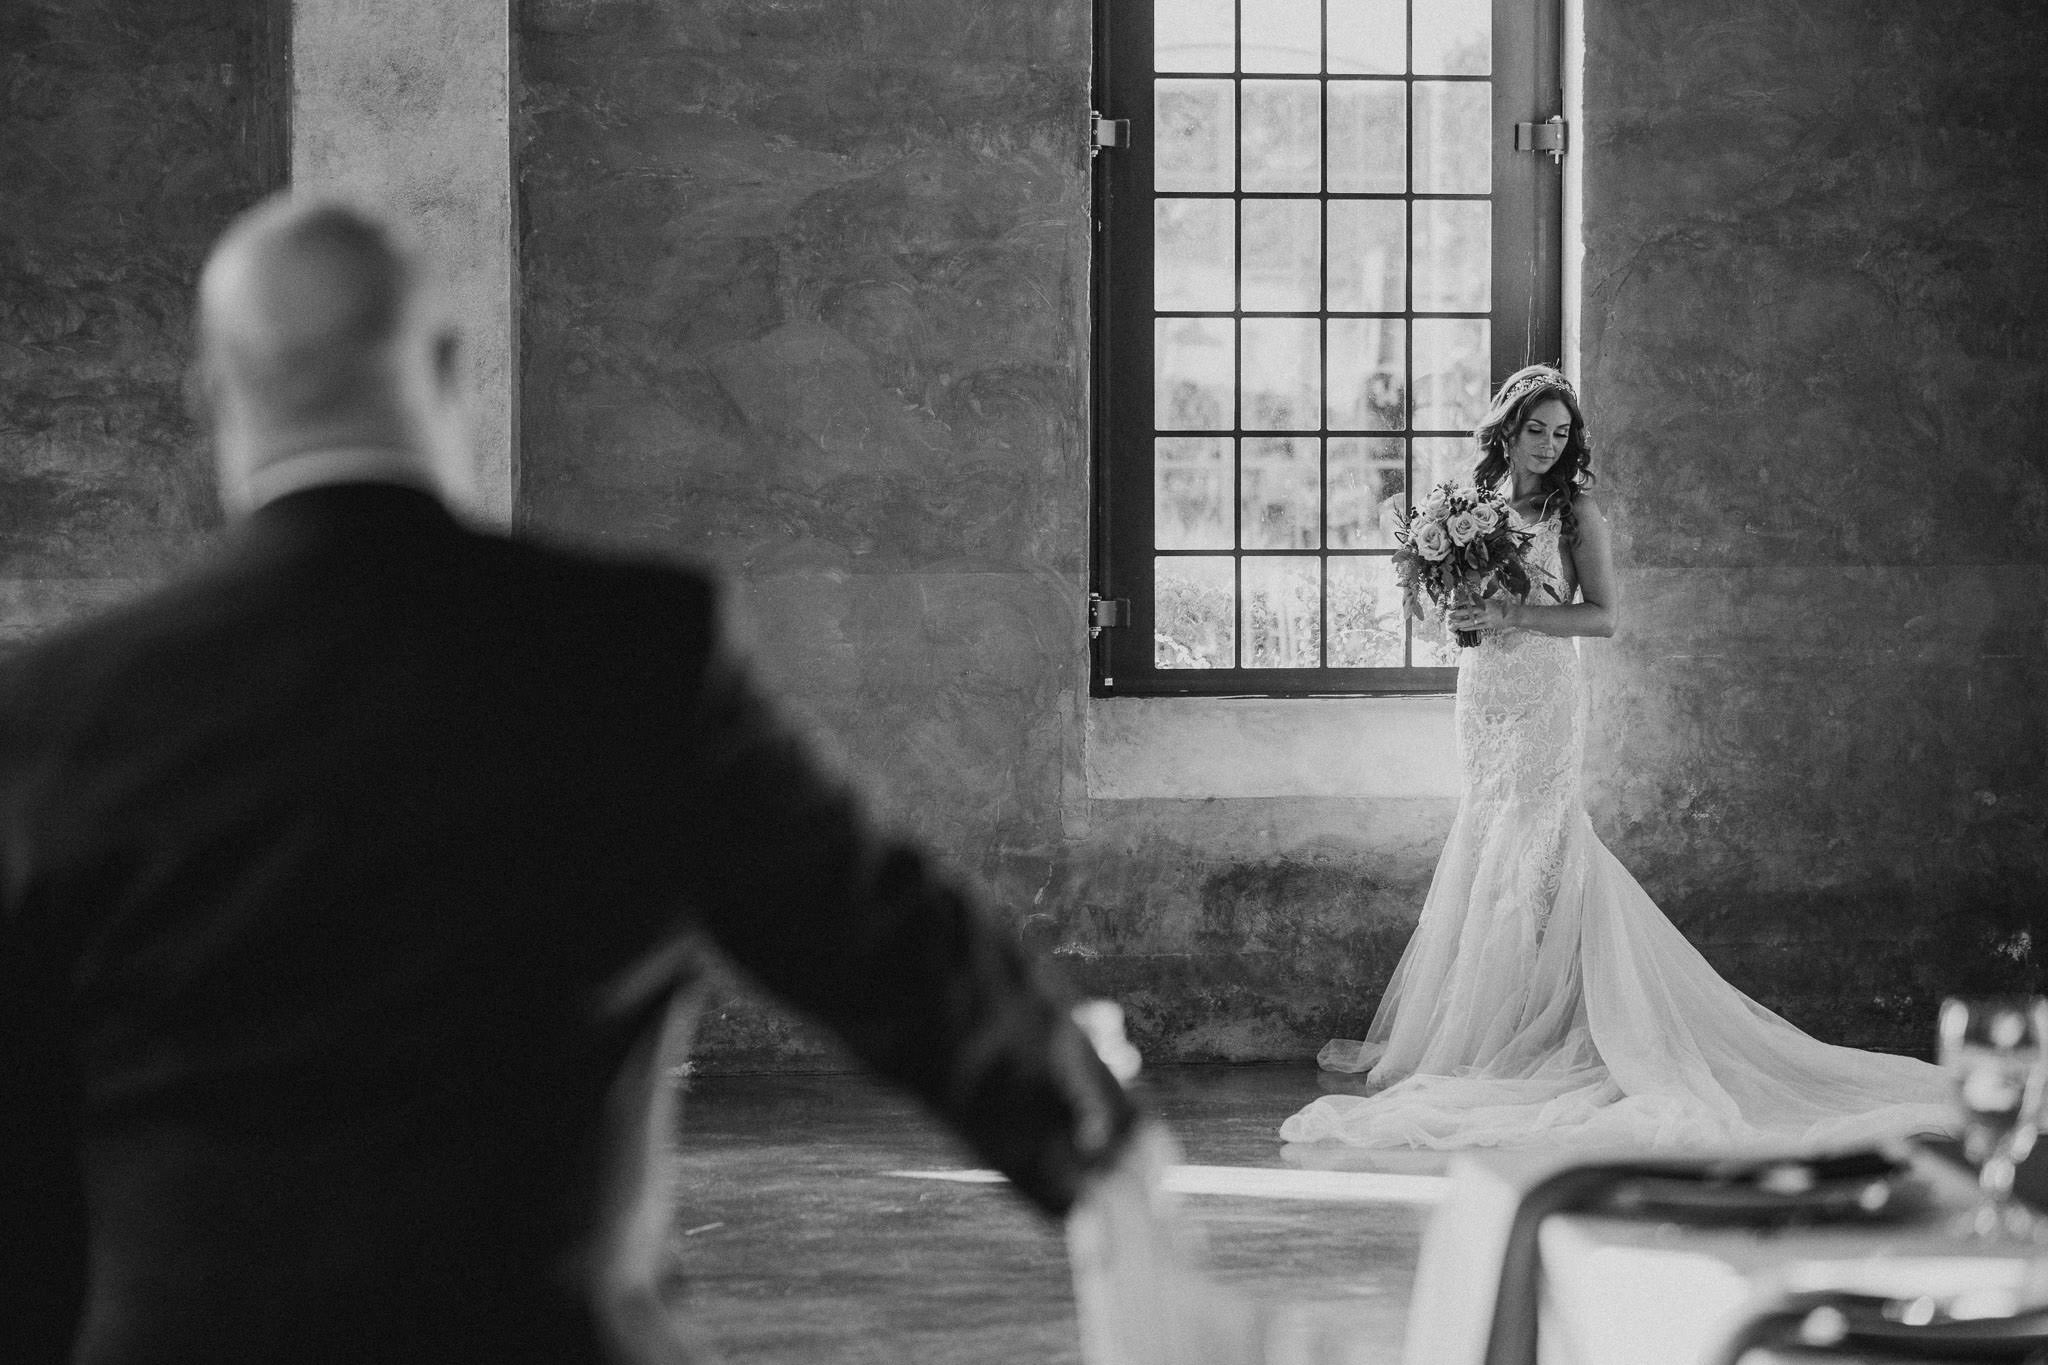 Cynthia-Curtis-Olde-Dobbine-Station-Houston-Wedding-Photographer-sm-53.jpg